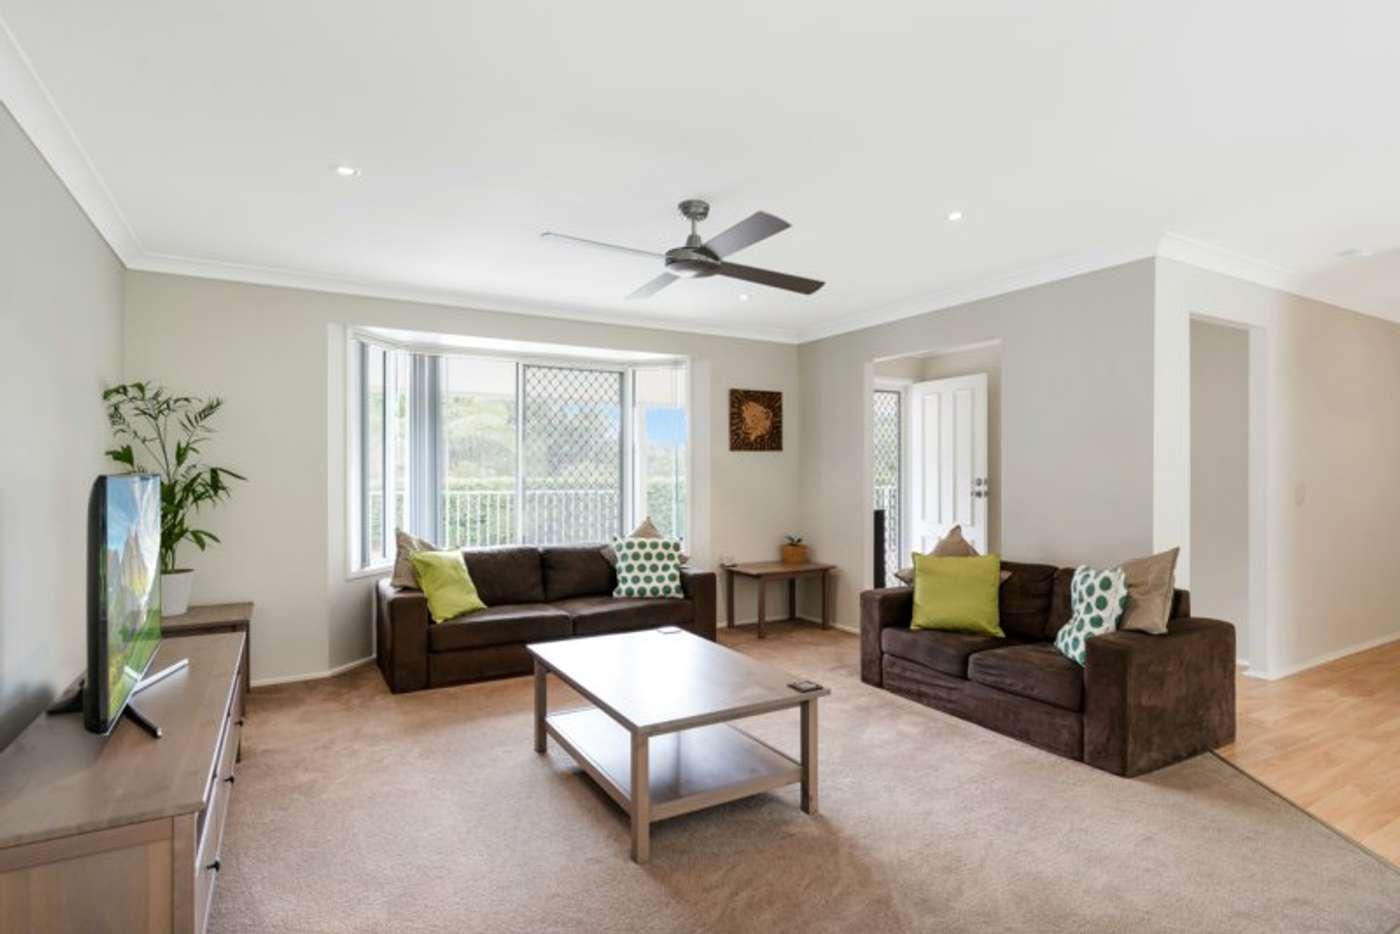 Sixth view of Homely house listing, 12 Mataranka Drive, Worongary QLD 4213